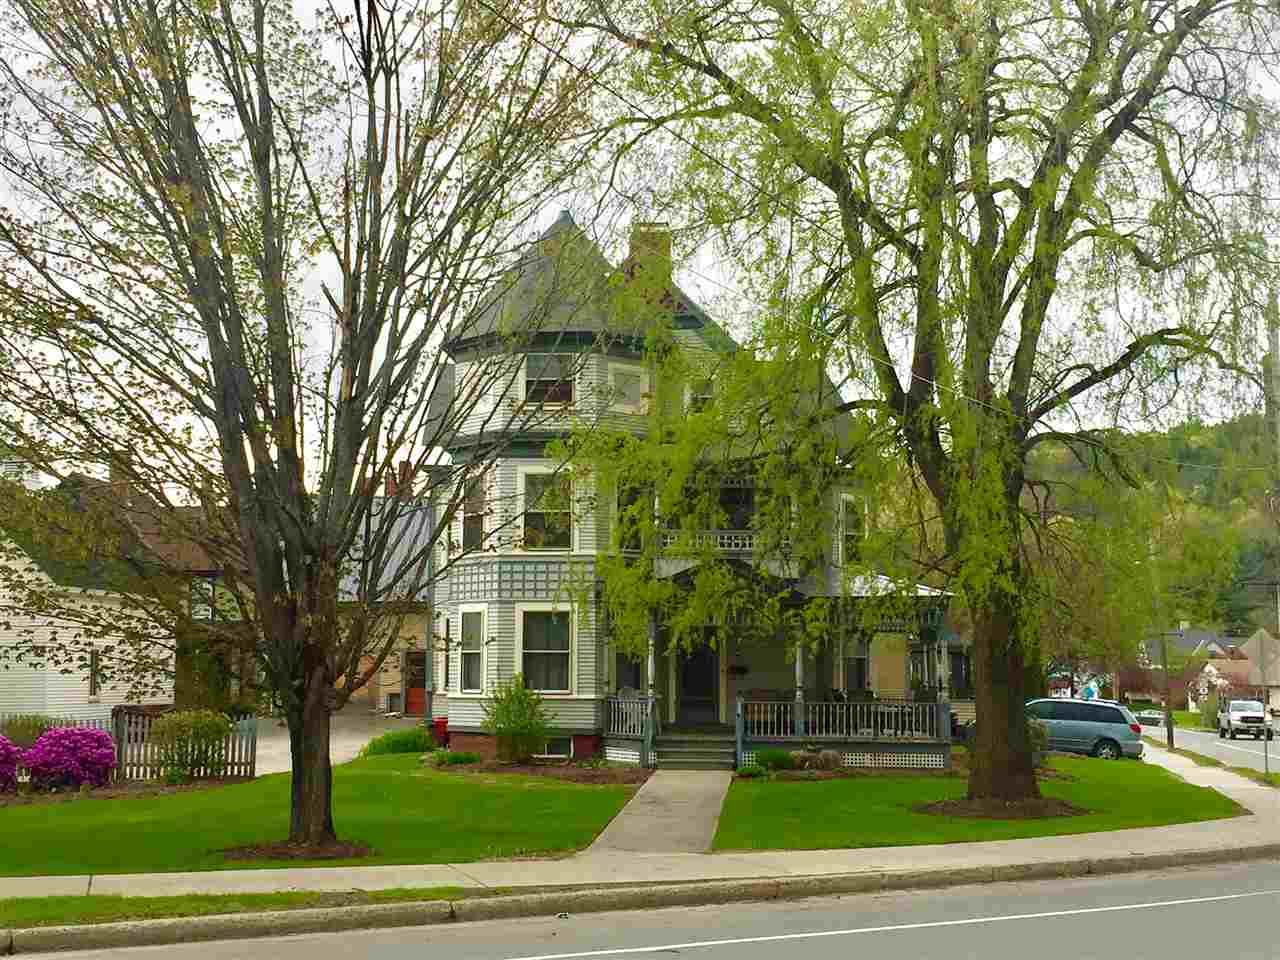 1577 Main Street, St. Johnsbury, VT - USA (photo 1)